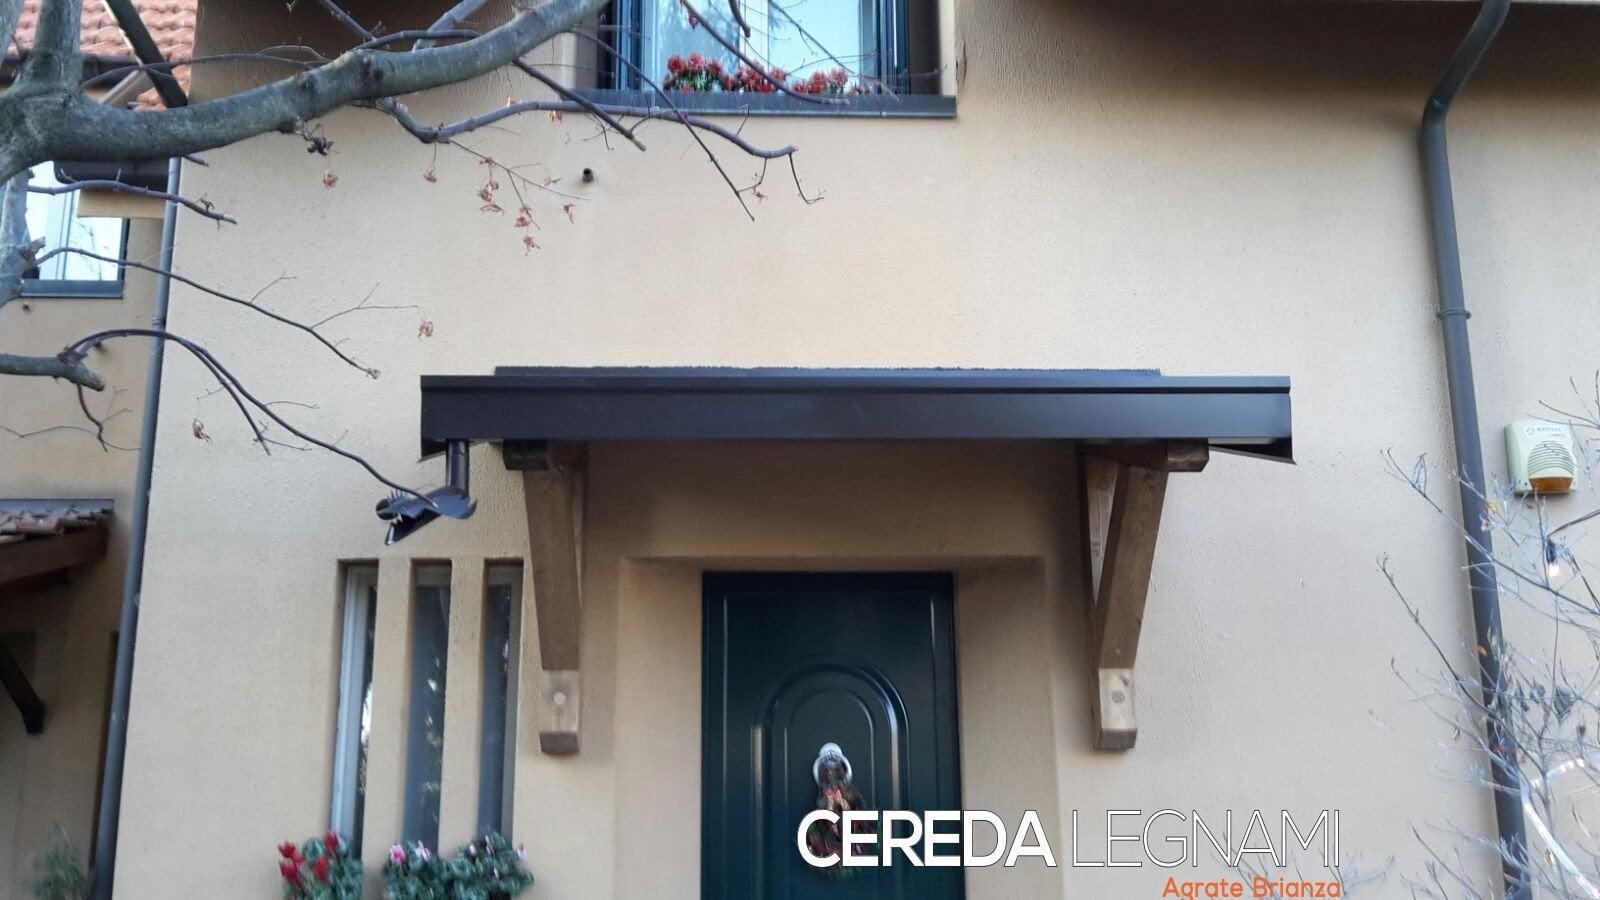 Douglas veranda disegno for Cereda legnami